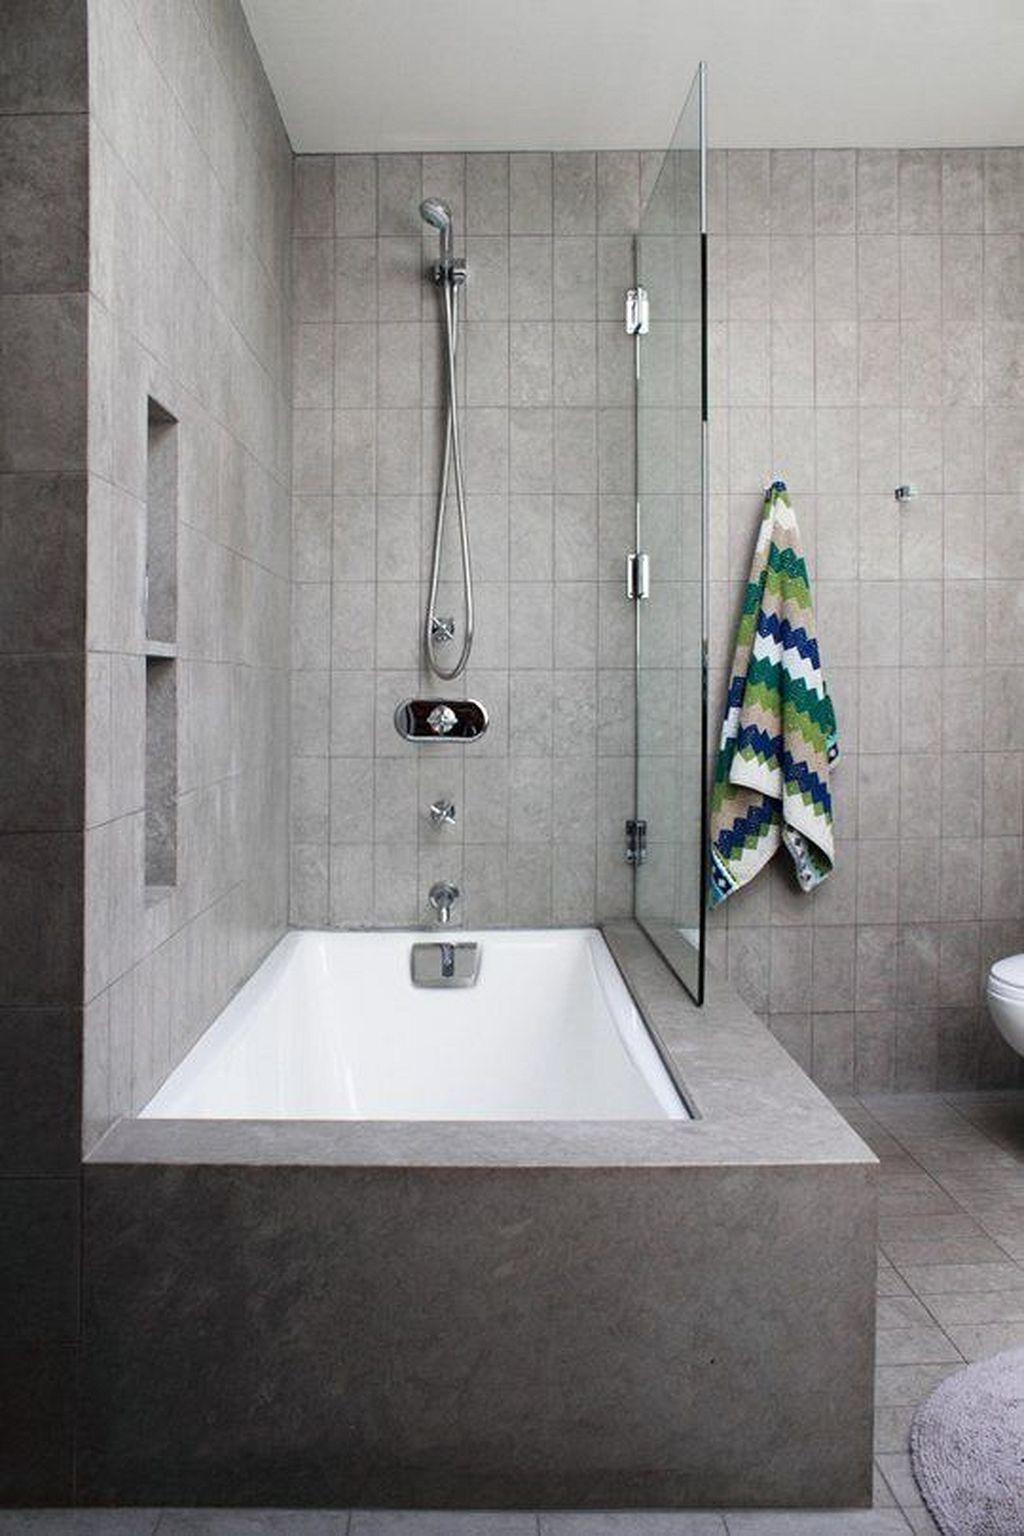 25 Small Bathroom Tub Shower Combo Ideas Bathroom Tub Shower Combo Bathroom Tub Shower Bathtub Shower Combo